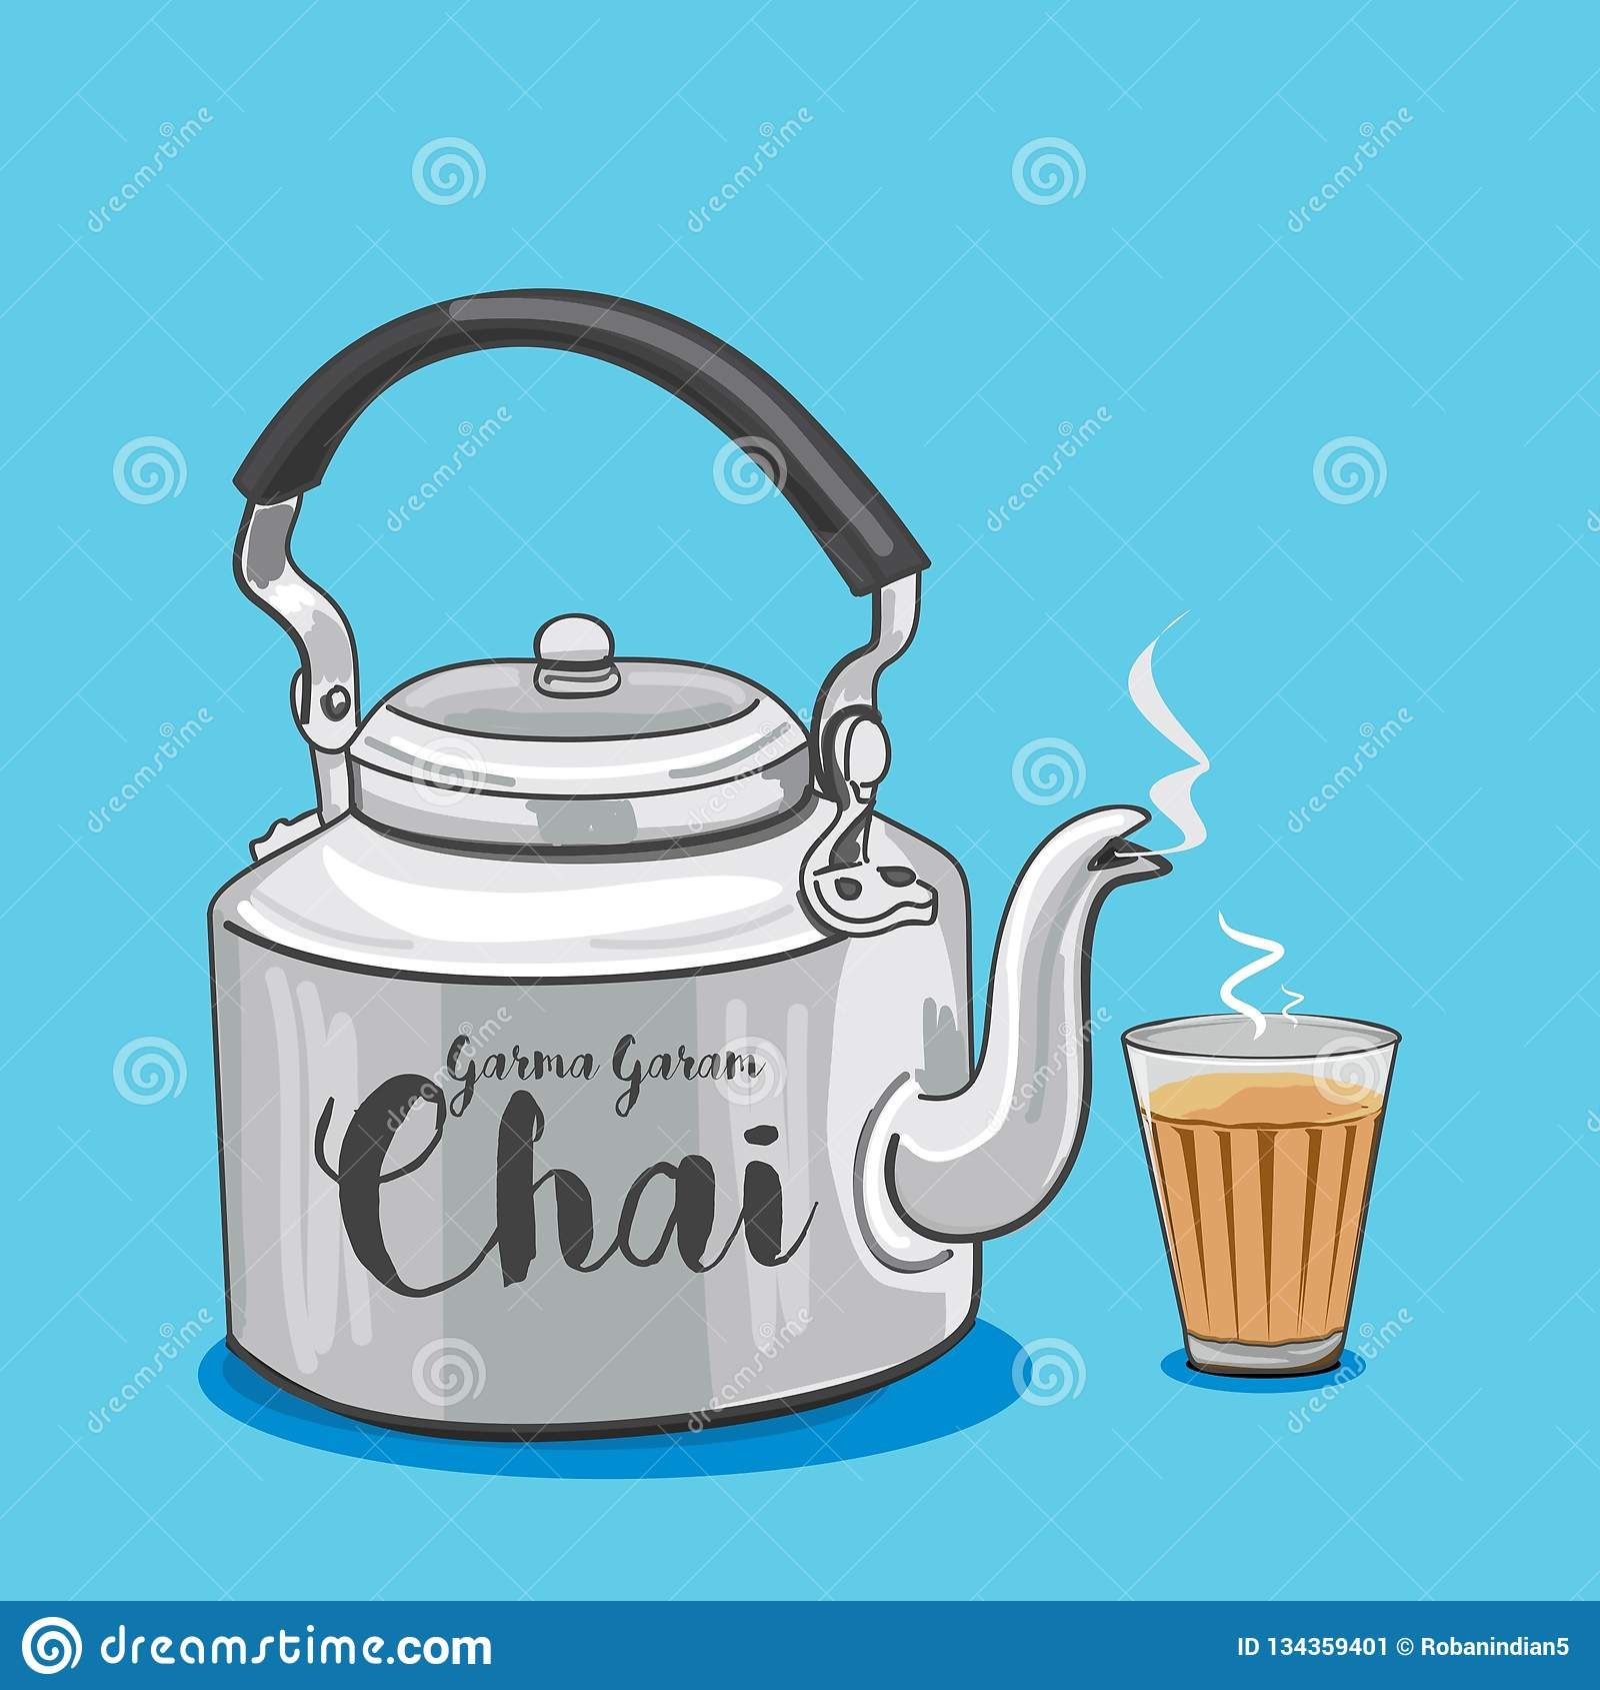 Indian Traditional Tea Pot Or Kettle Vector Illustration